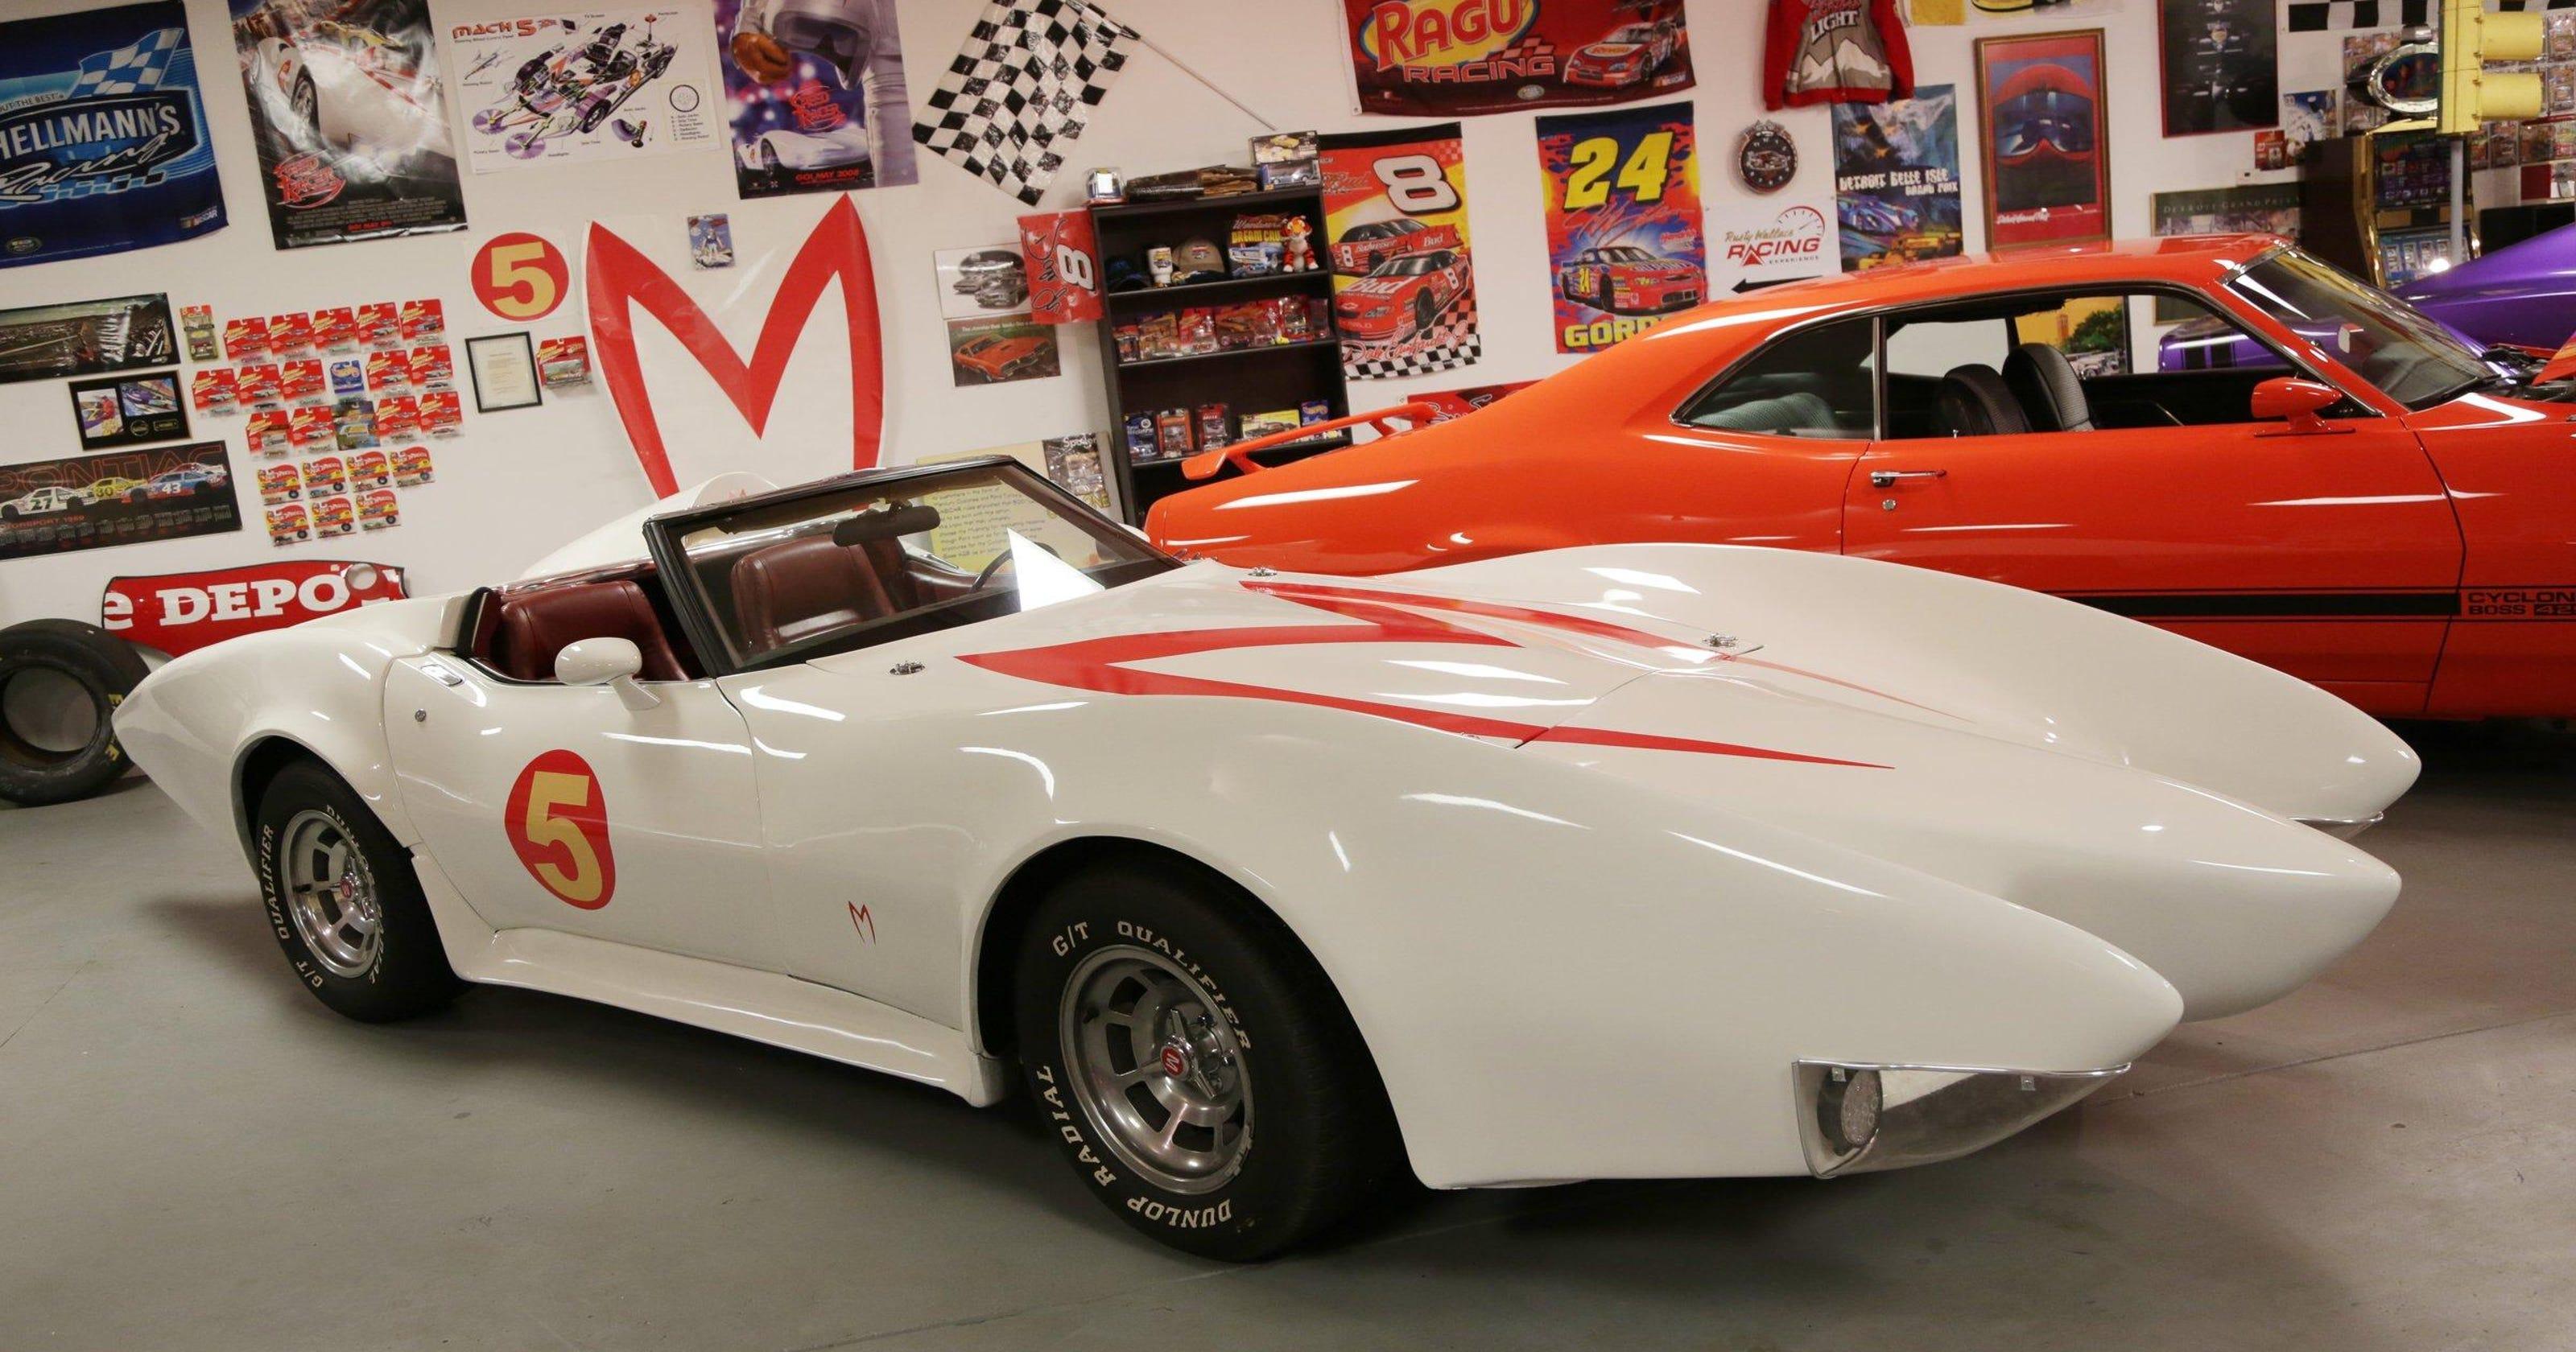 Star Cars Movie Cars Cars Dumb dumber Vehicles t